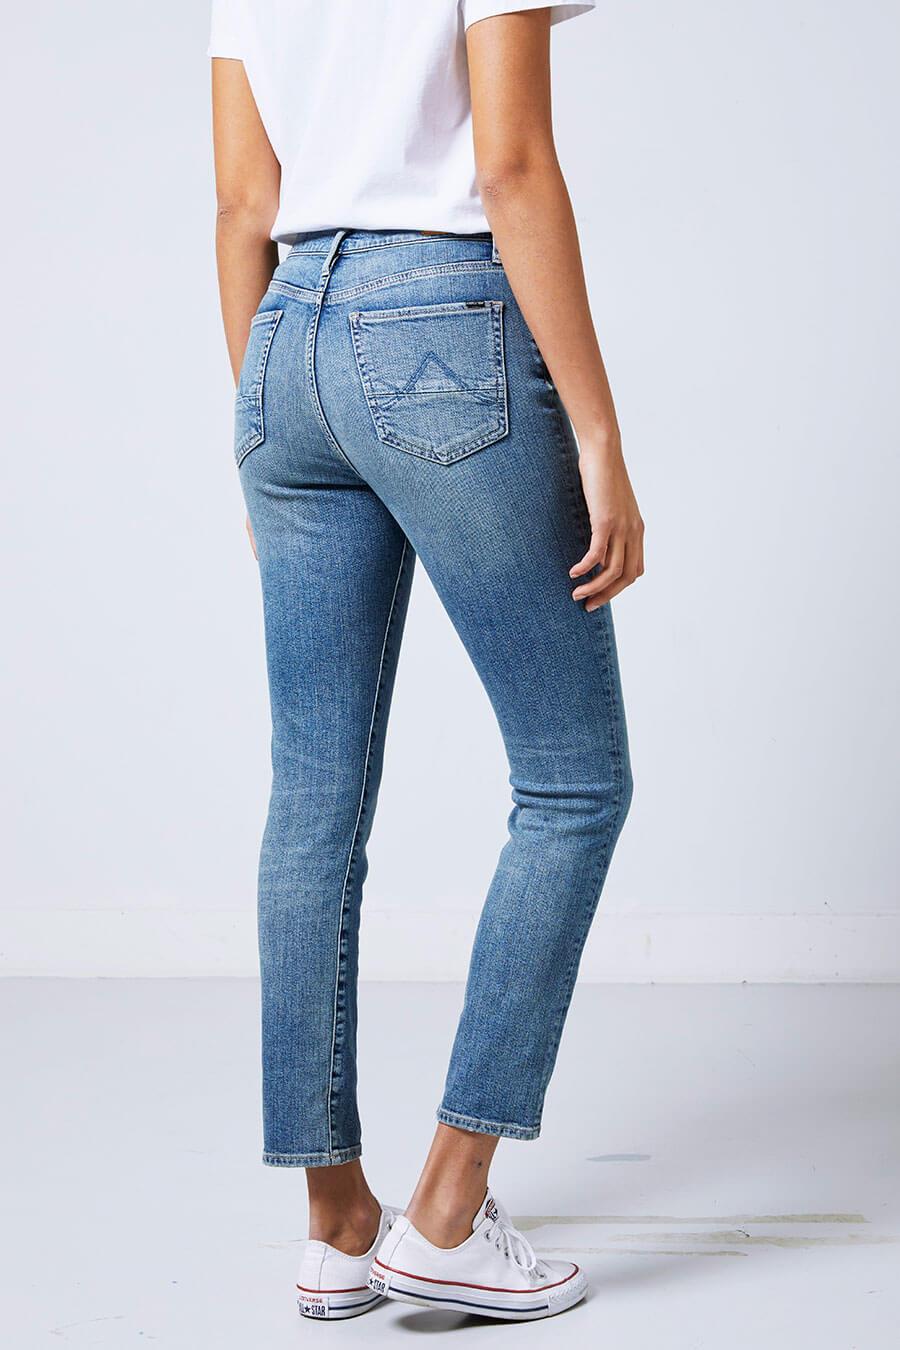 jacy Jeans alt